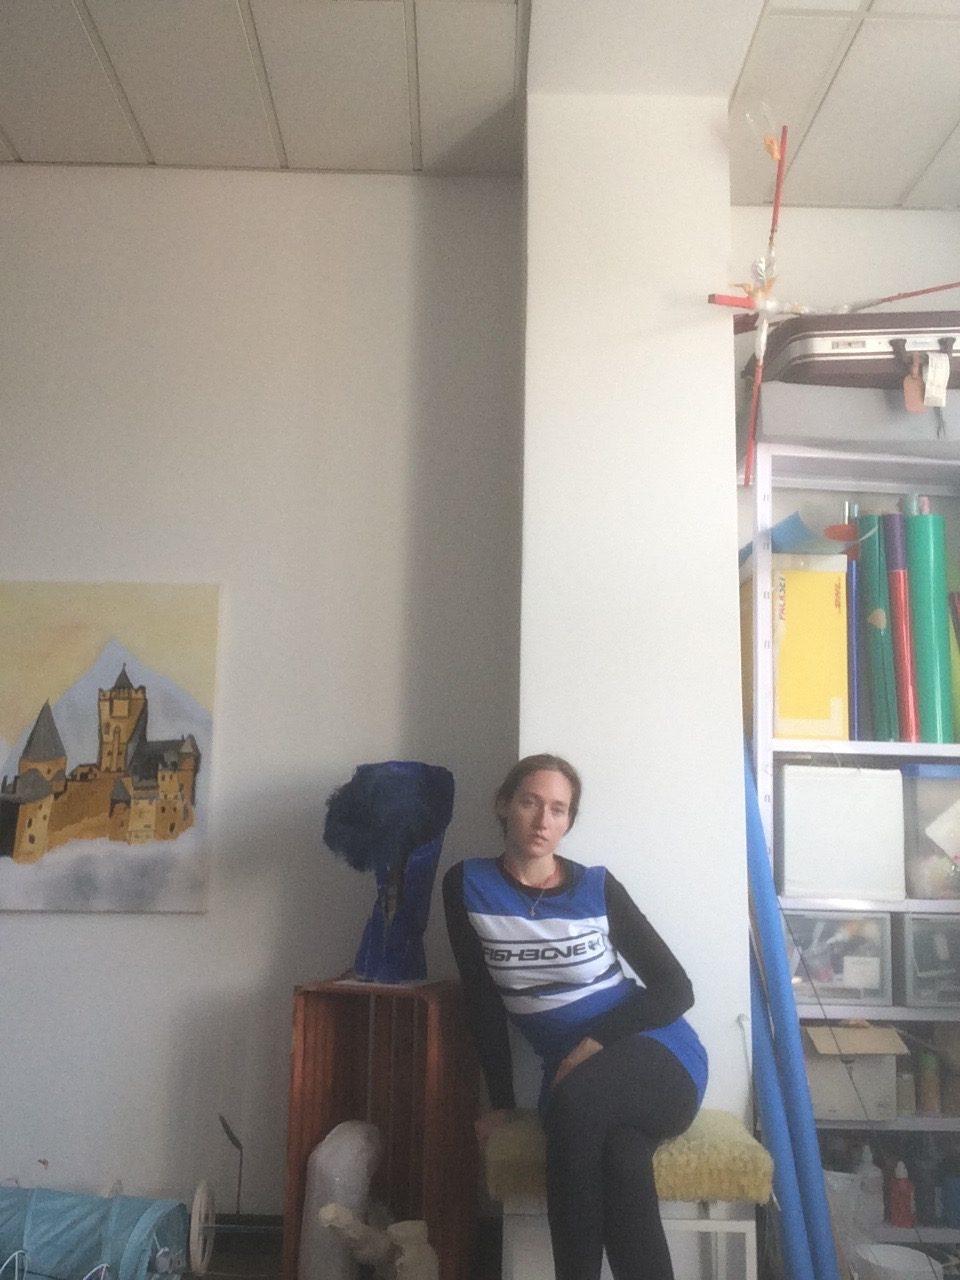 Okka-Esther Hungerbühler | Profil Image 3